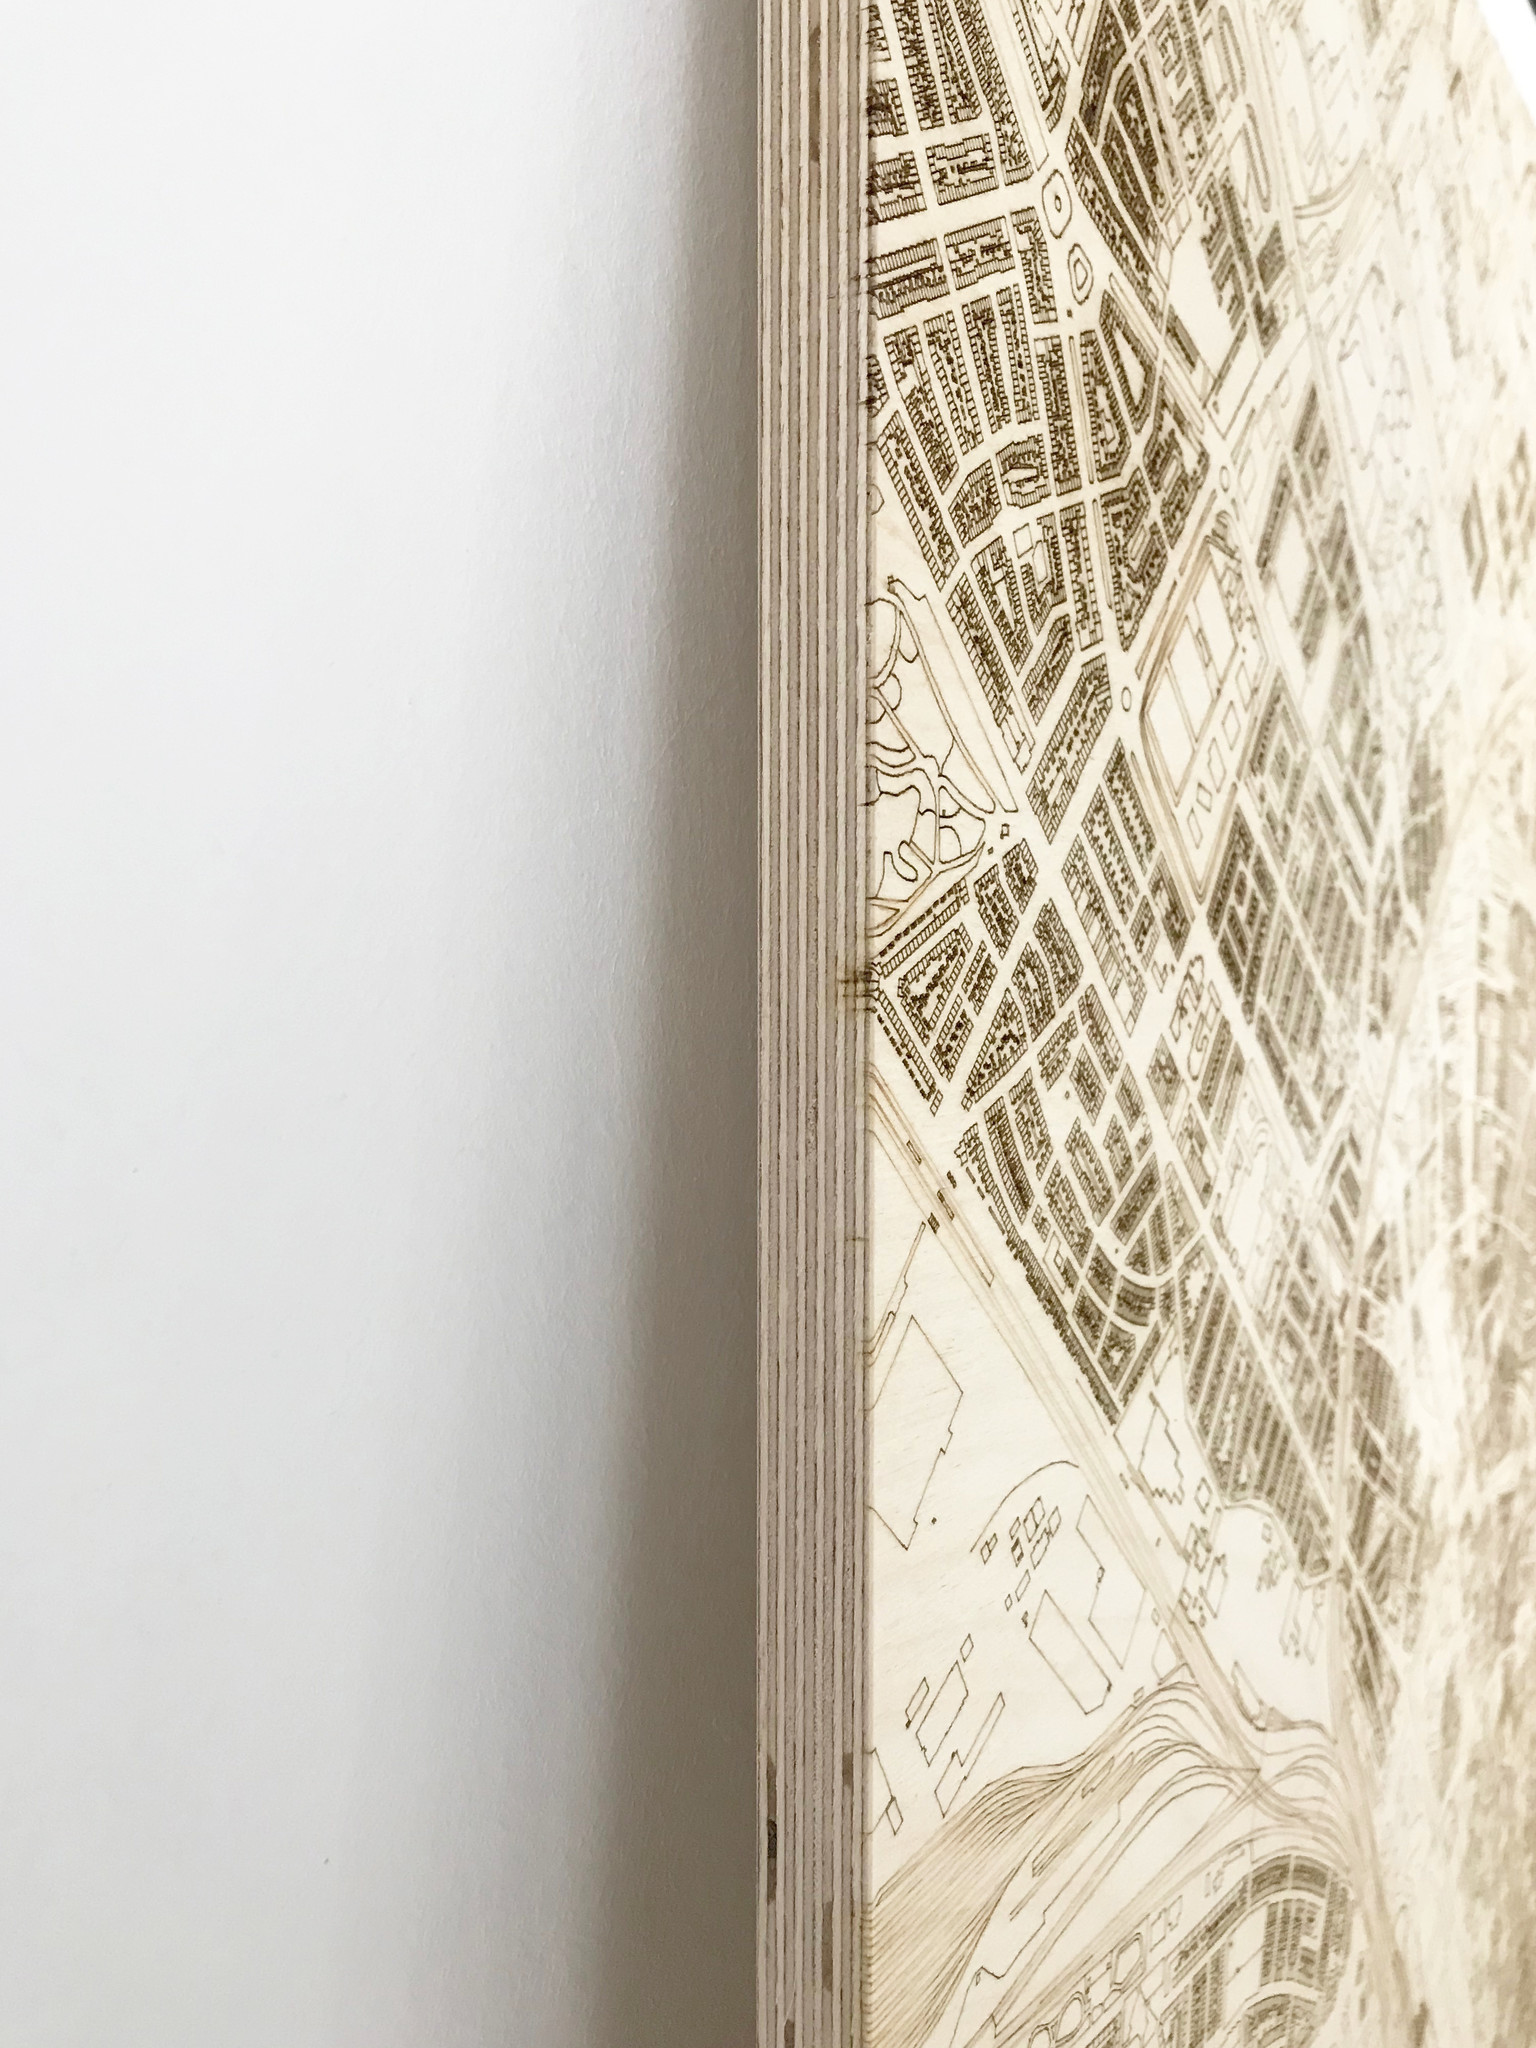 Wandbild Stadtplan München | Wanddekoration Holz-4